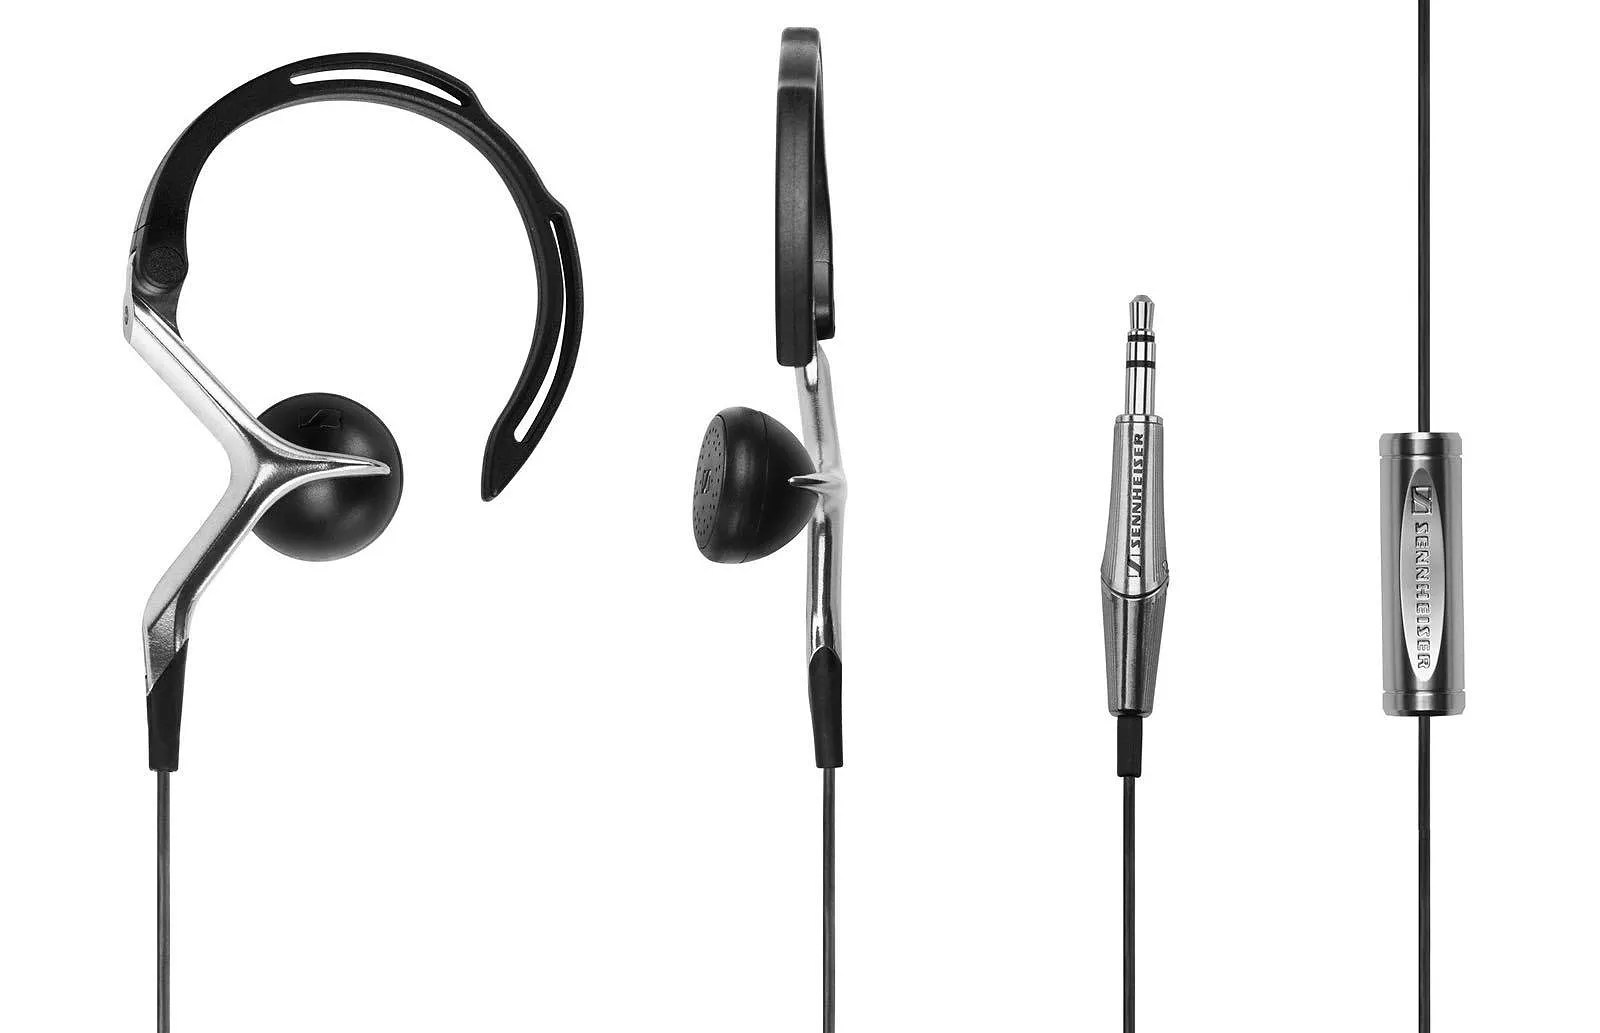 Sennheiser Omx 980 High Fidelity Headphones By Bmw